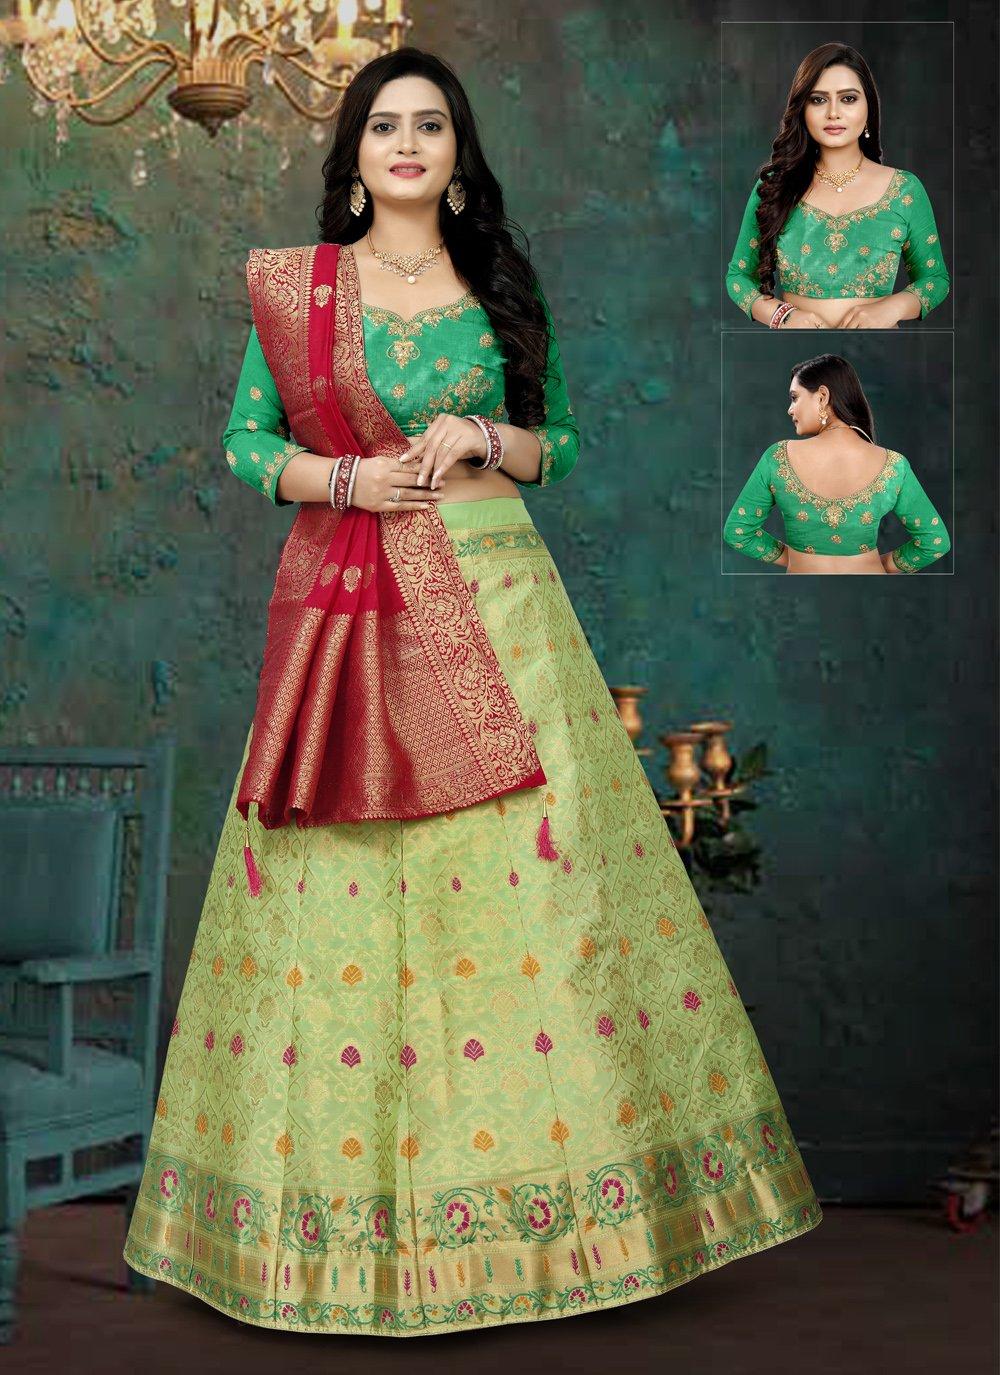 Green Engagement Banarasi Silk Lehenga Choli